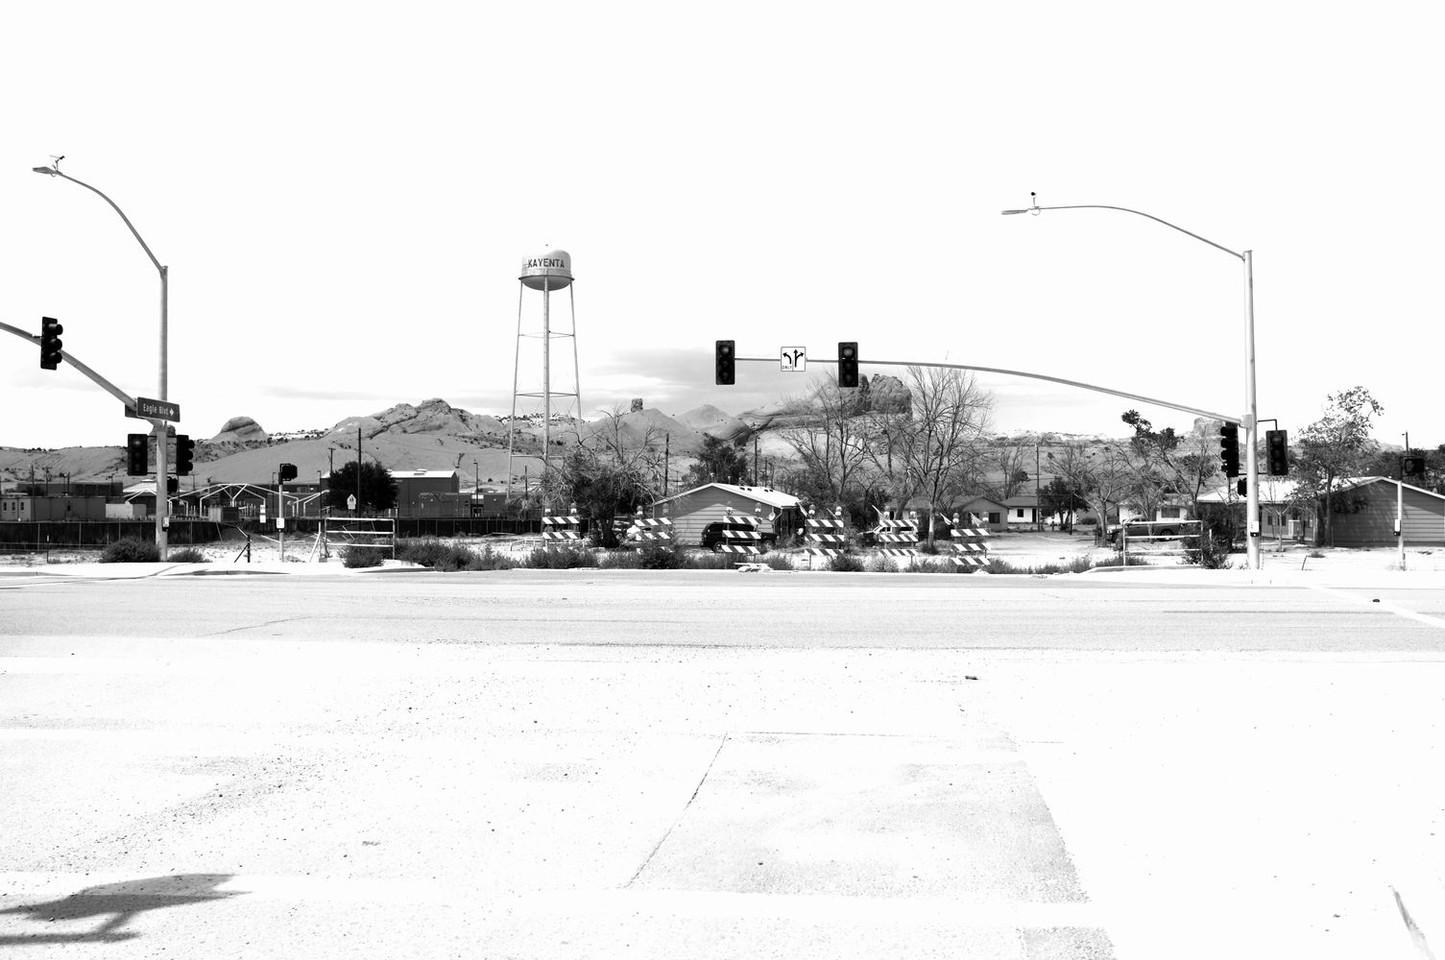 kayenta - Arizona